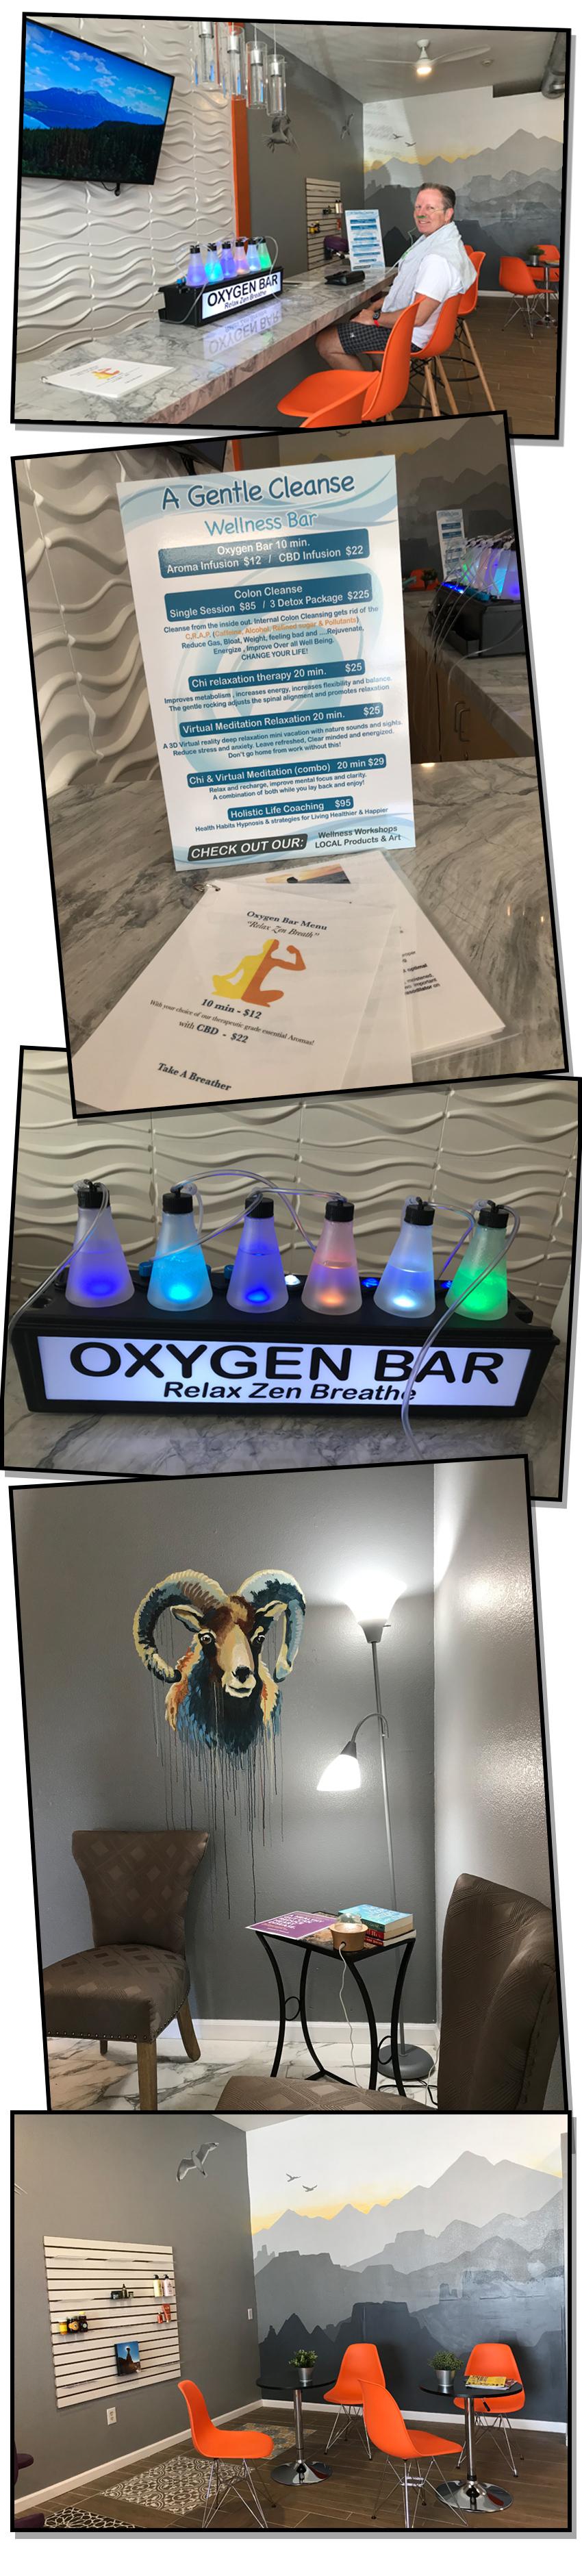 Oxygen Bar Collage Boulder City, Nevada